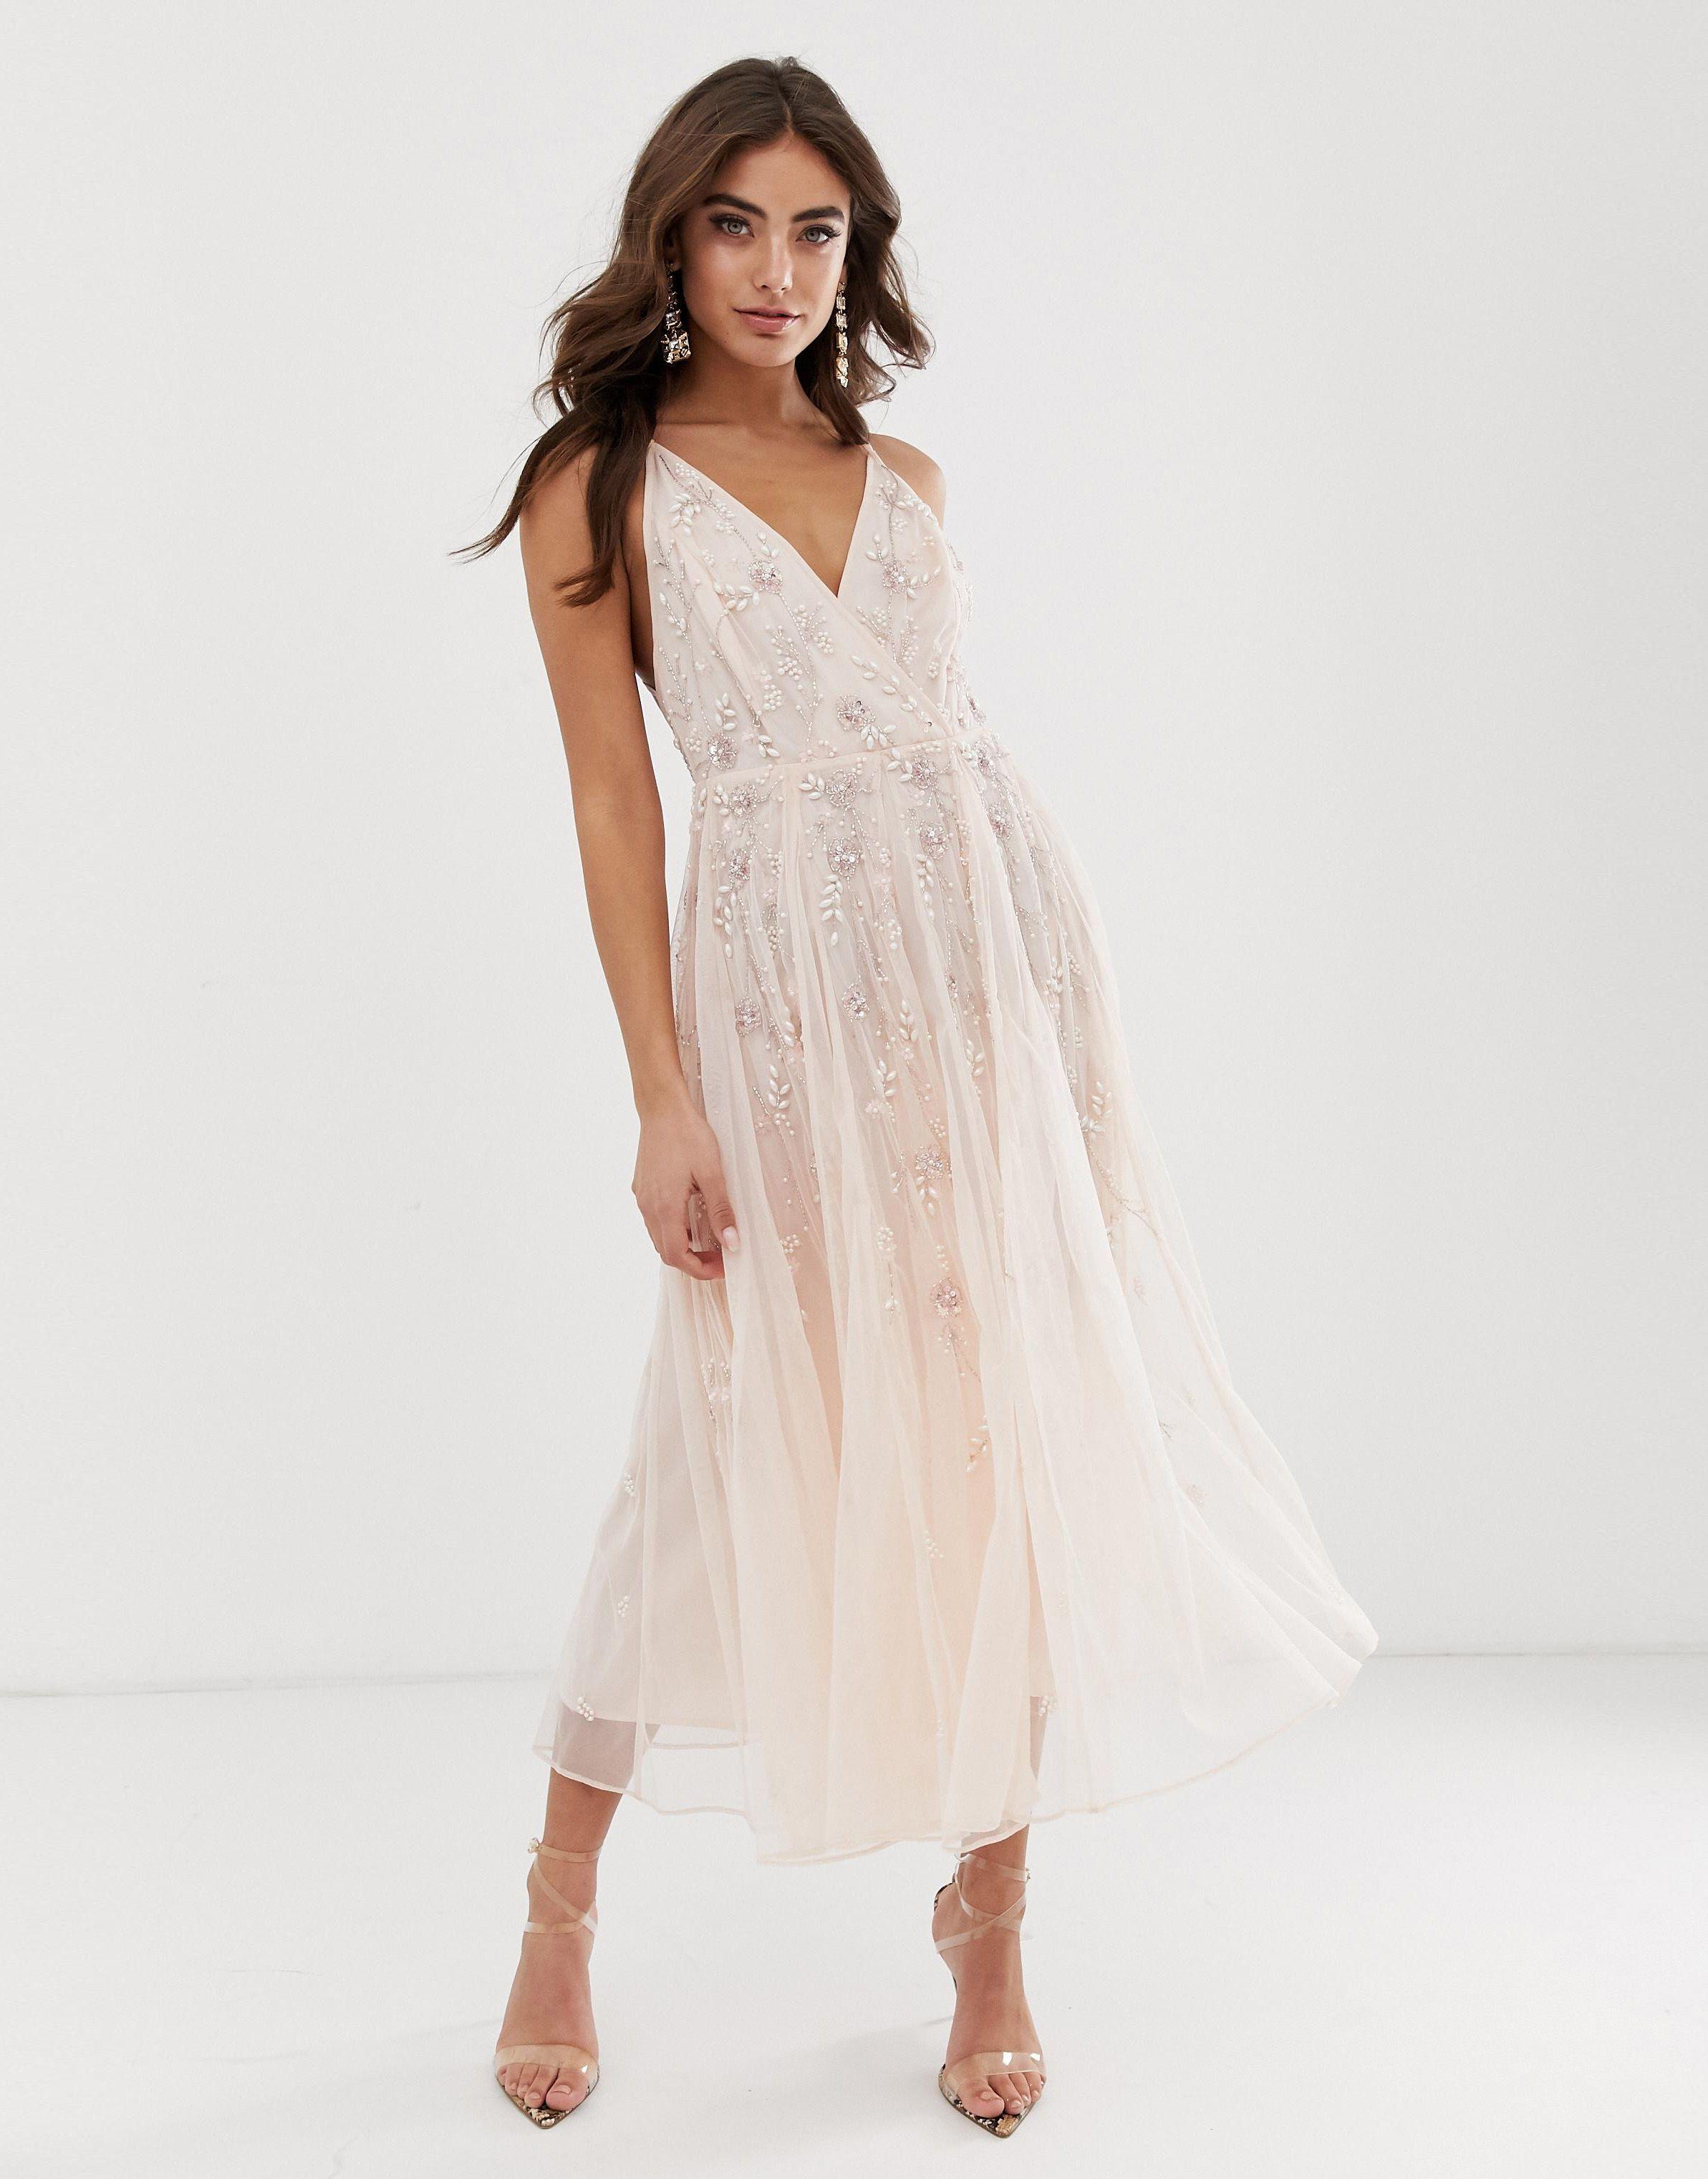 32 Beautiful Summer Wedding Guest Dresses For 2020 In 2020 Strappy Midi Dress Maxi Dress Prom Mini Prom Dresses,Nordstrom Wedding Guest Dresses Sale